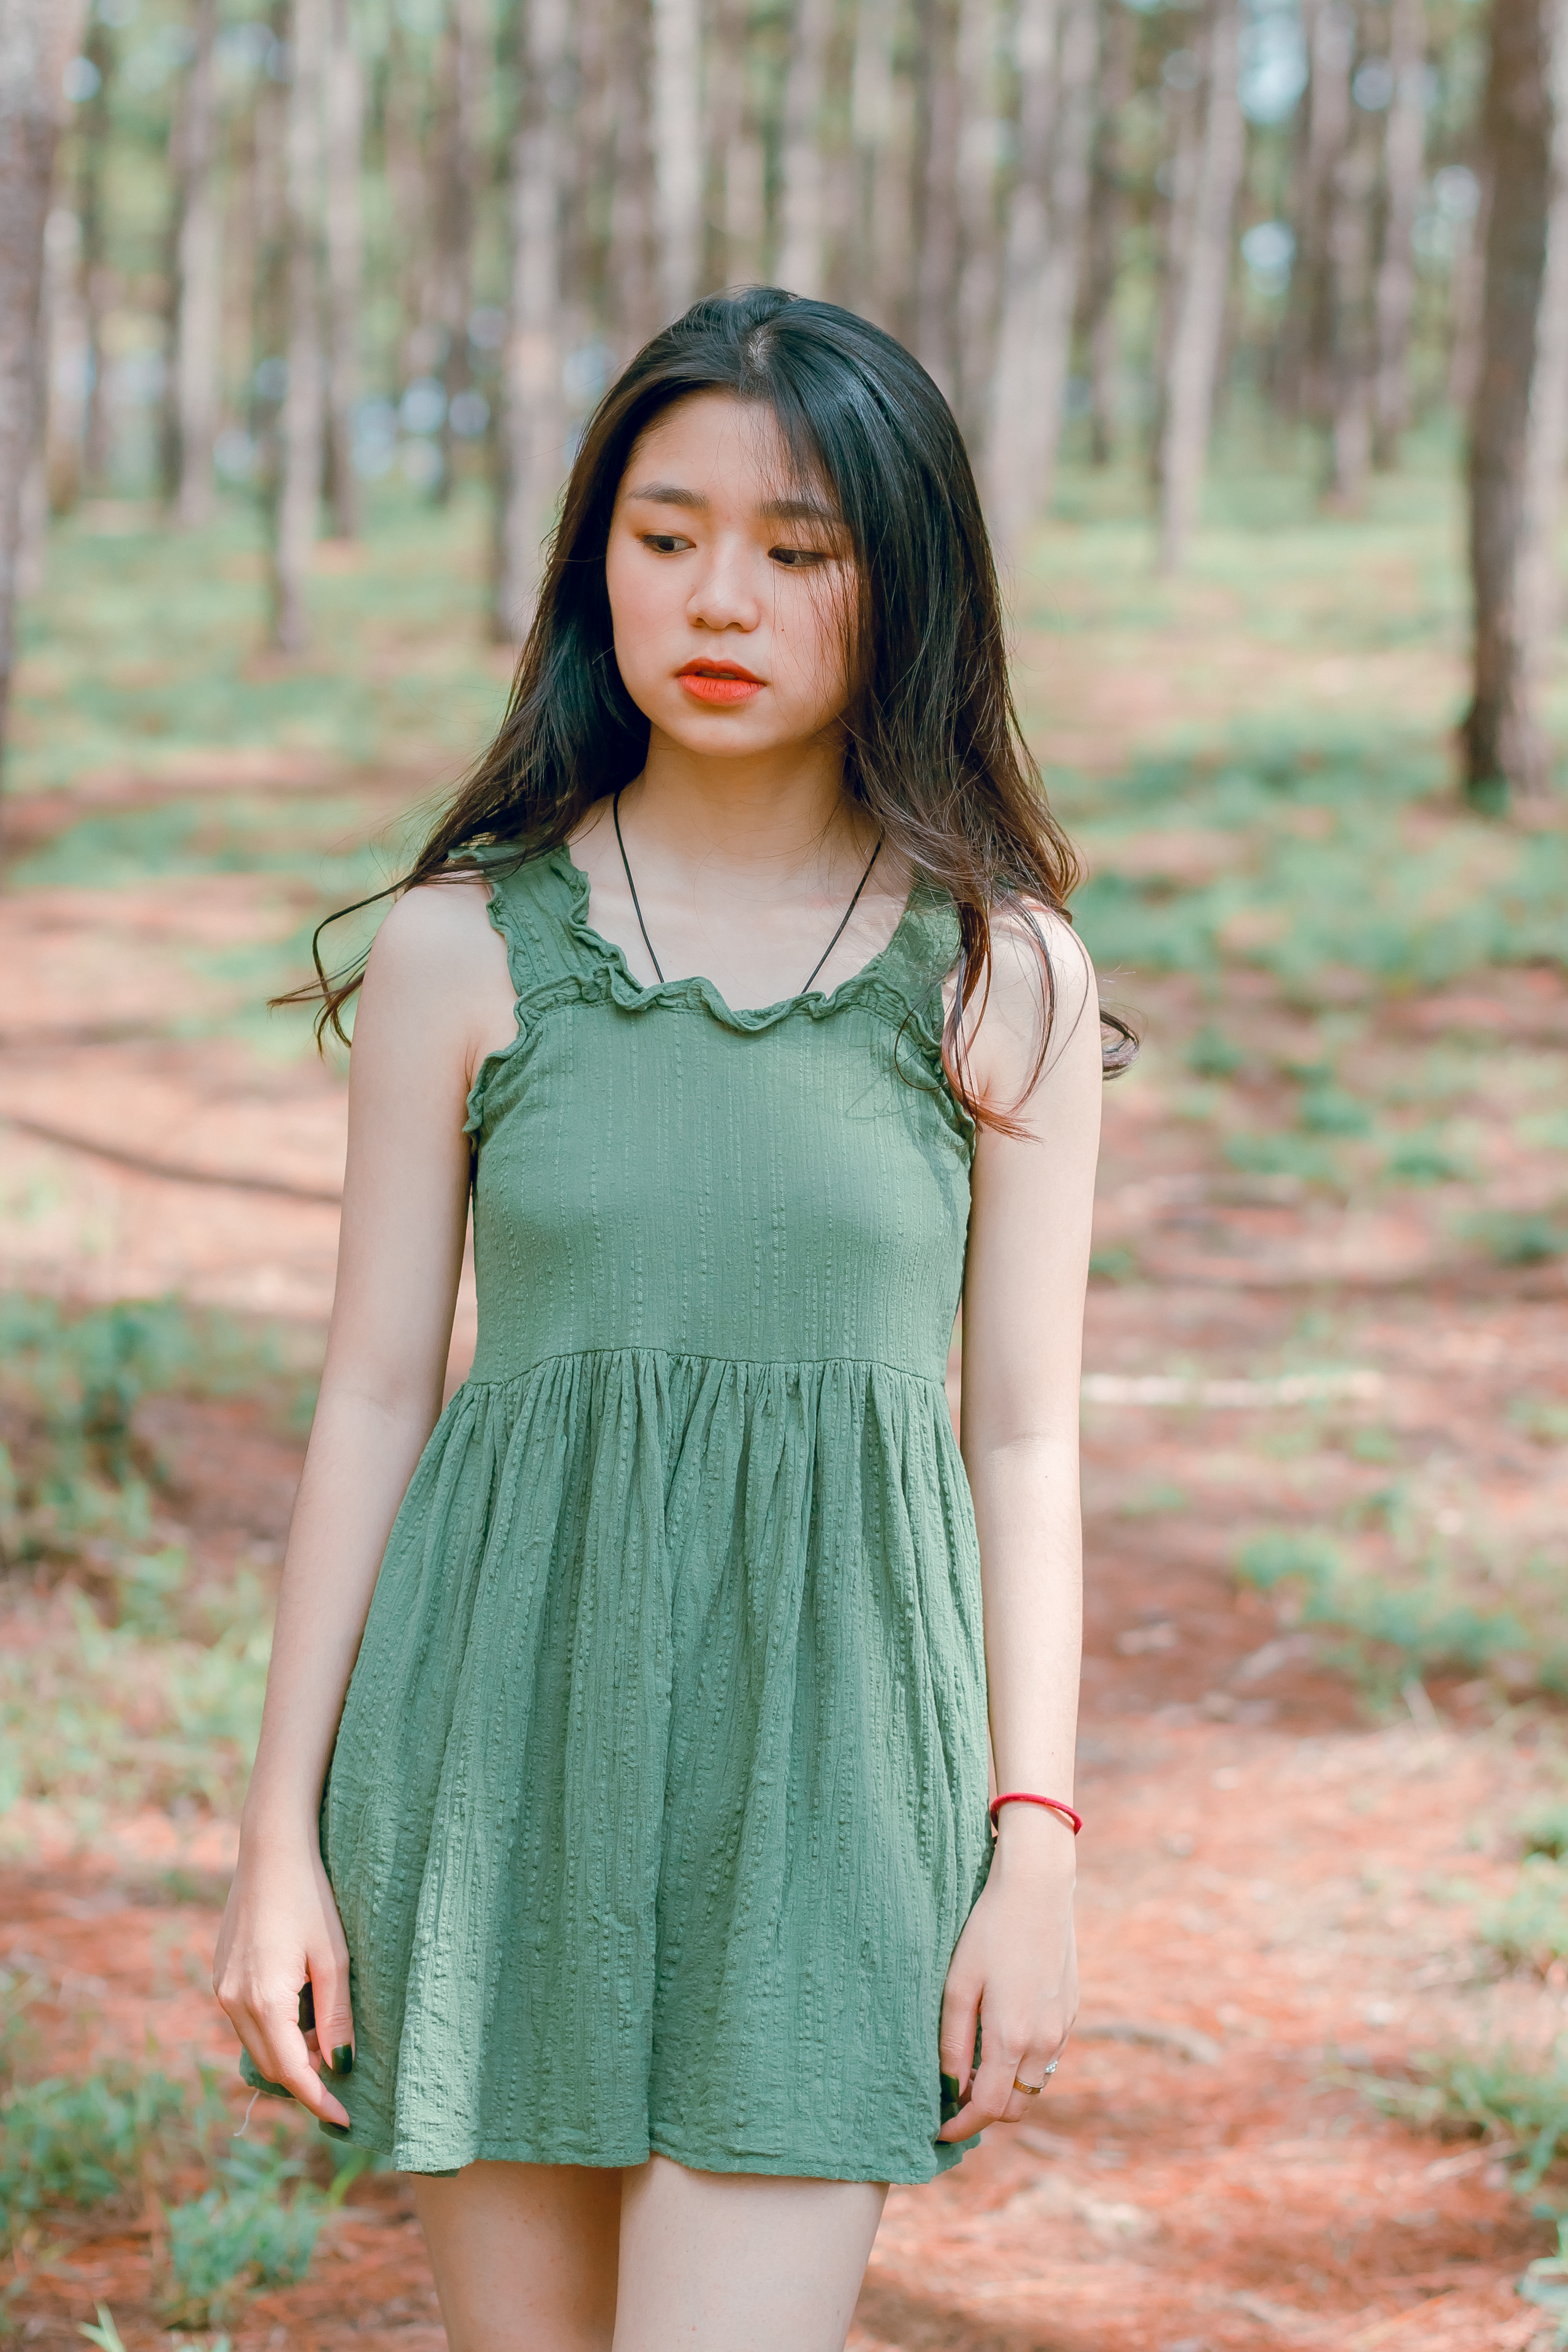 Onkyo TX-nr515 orgieJung v Jung Chi datovania